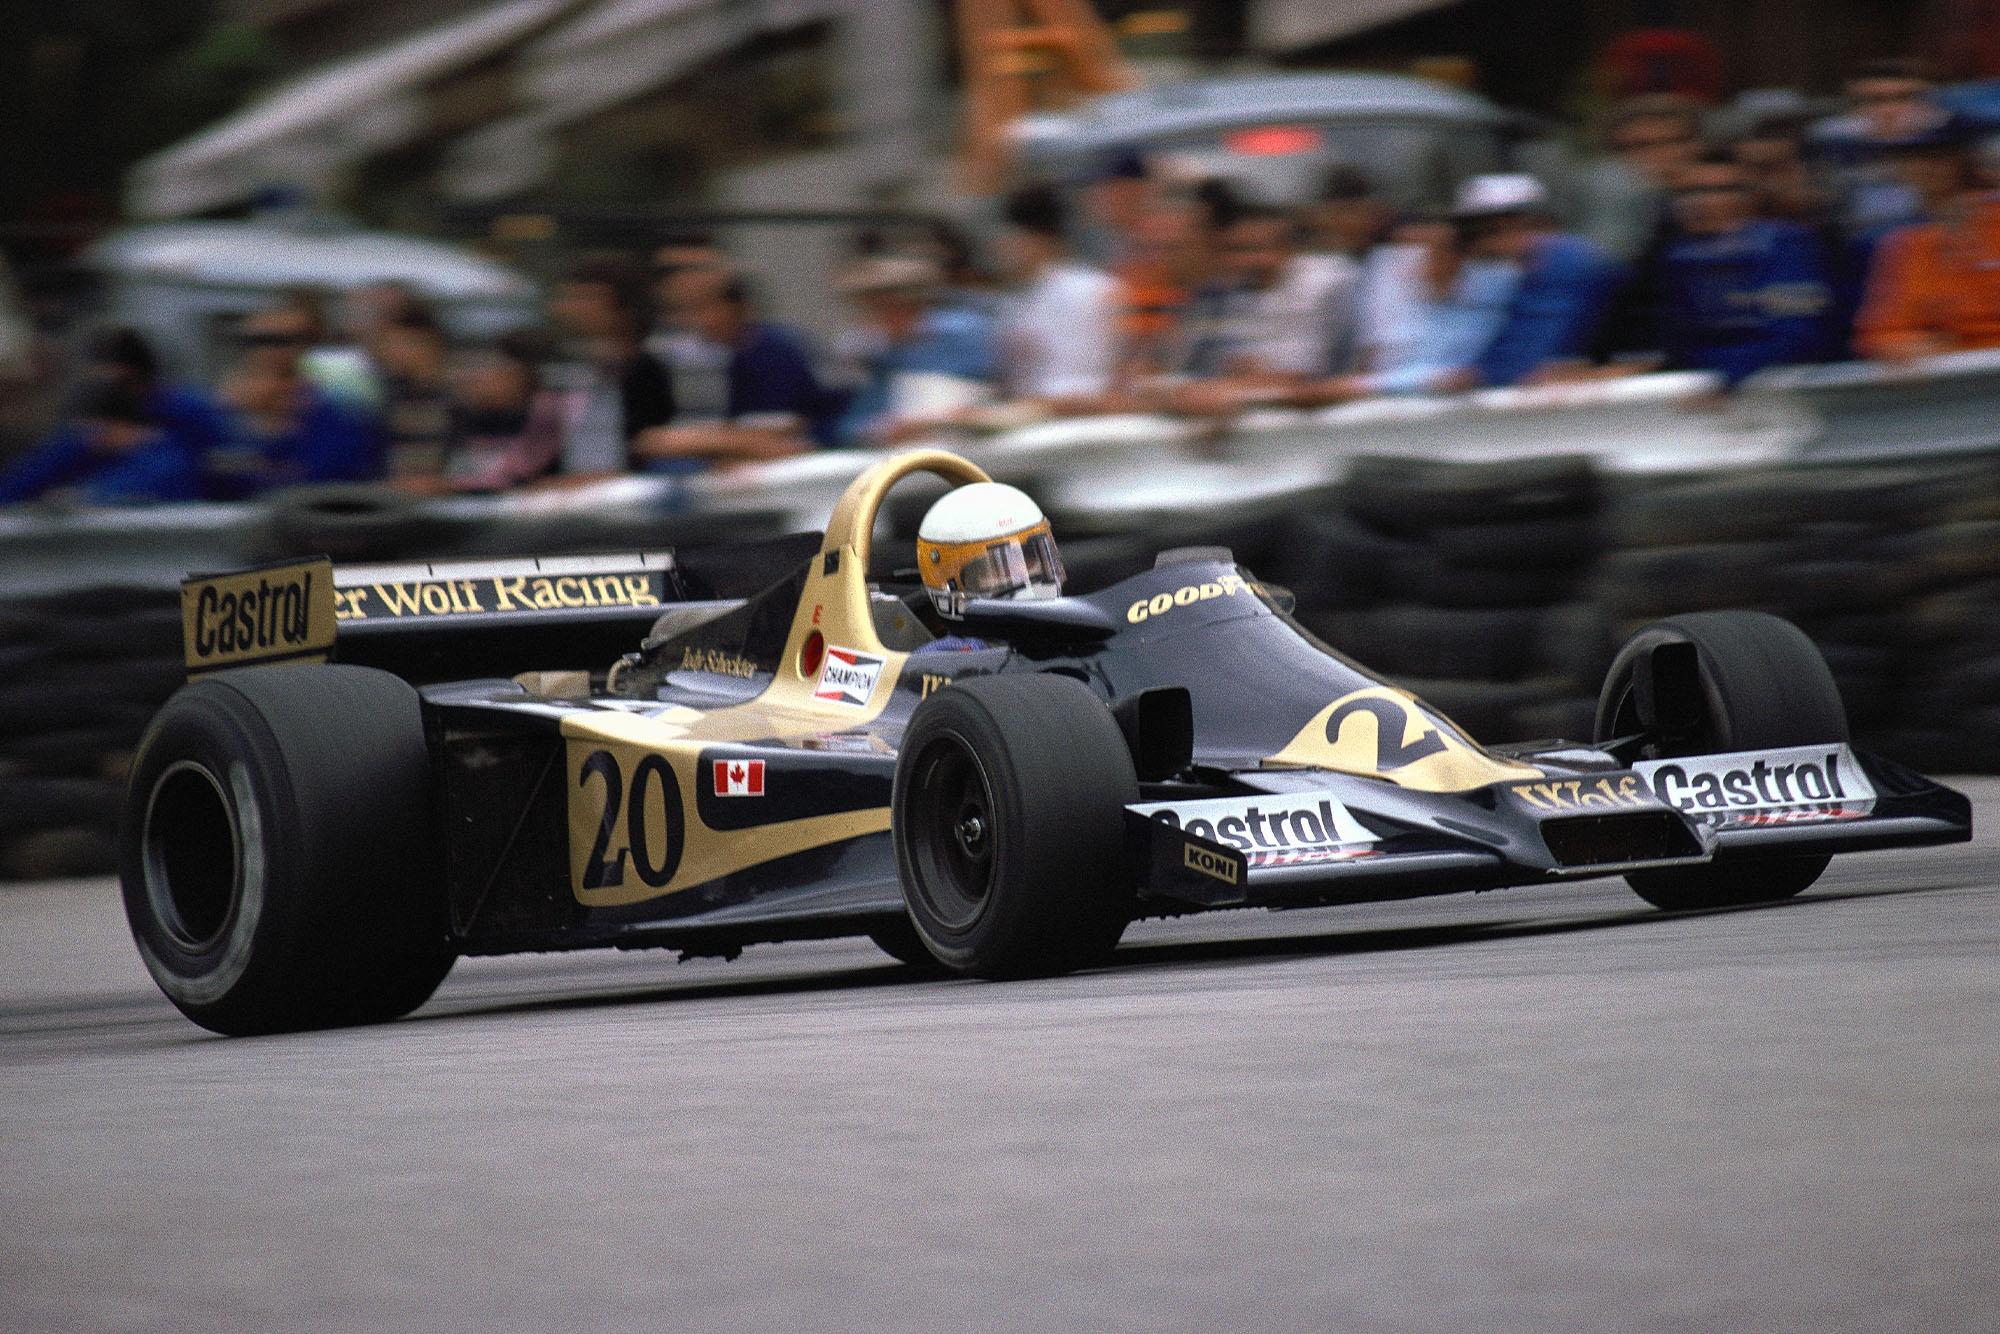 Jody Scheckter (Wolf) at the 1977 Monaco Grand Prix.